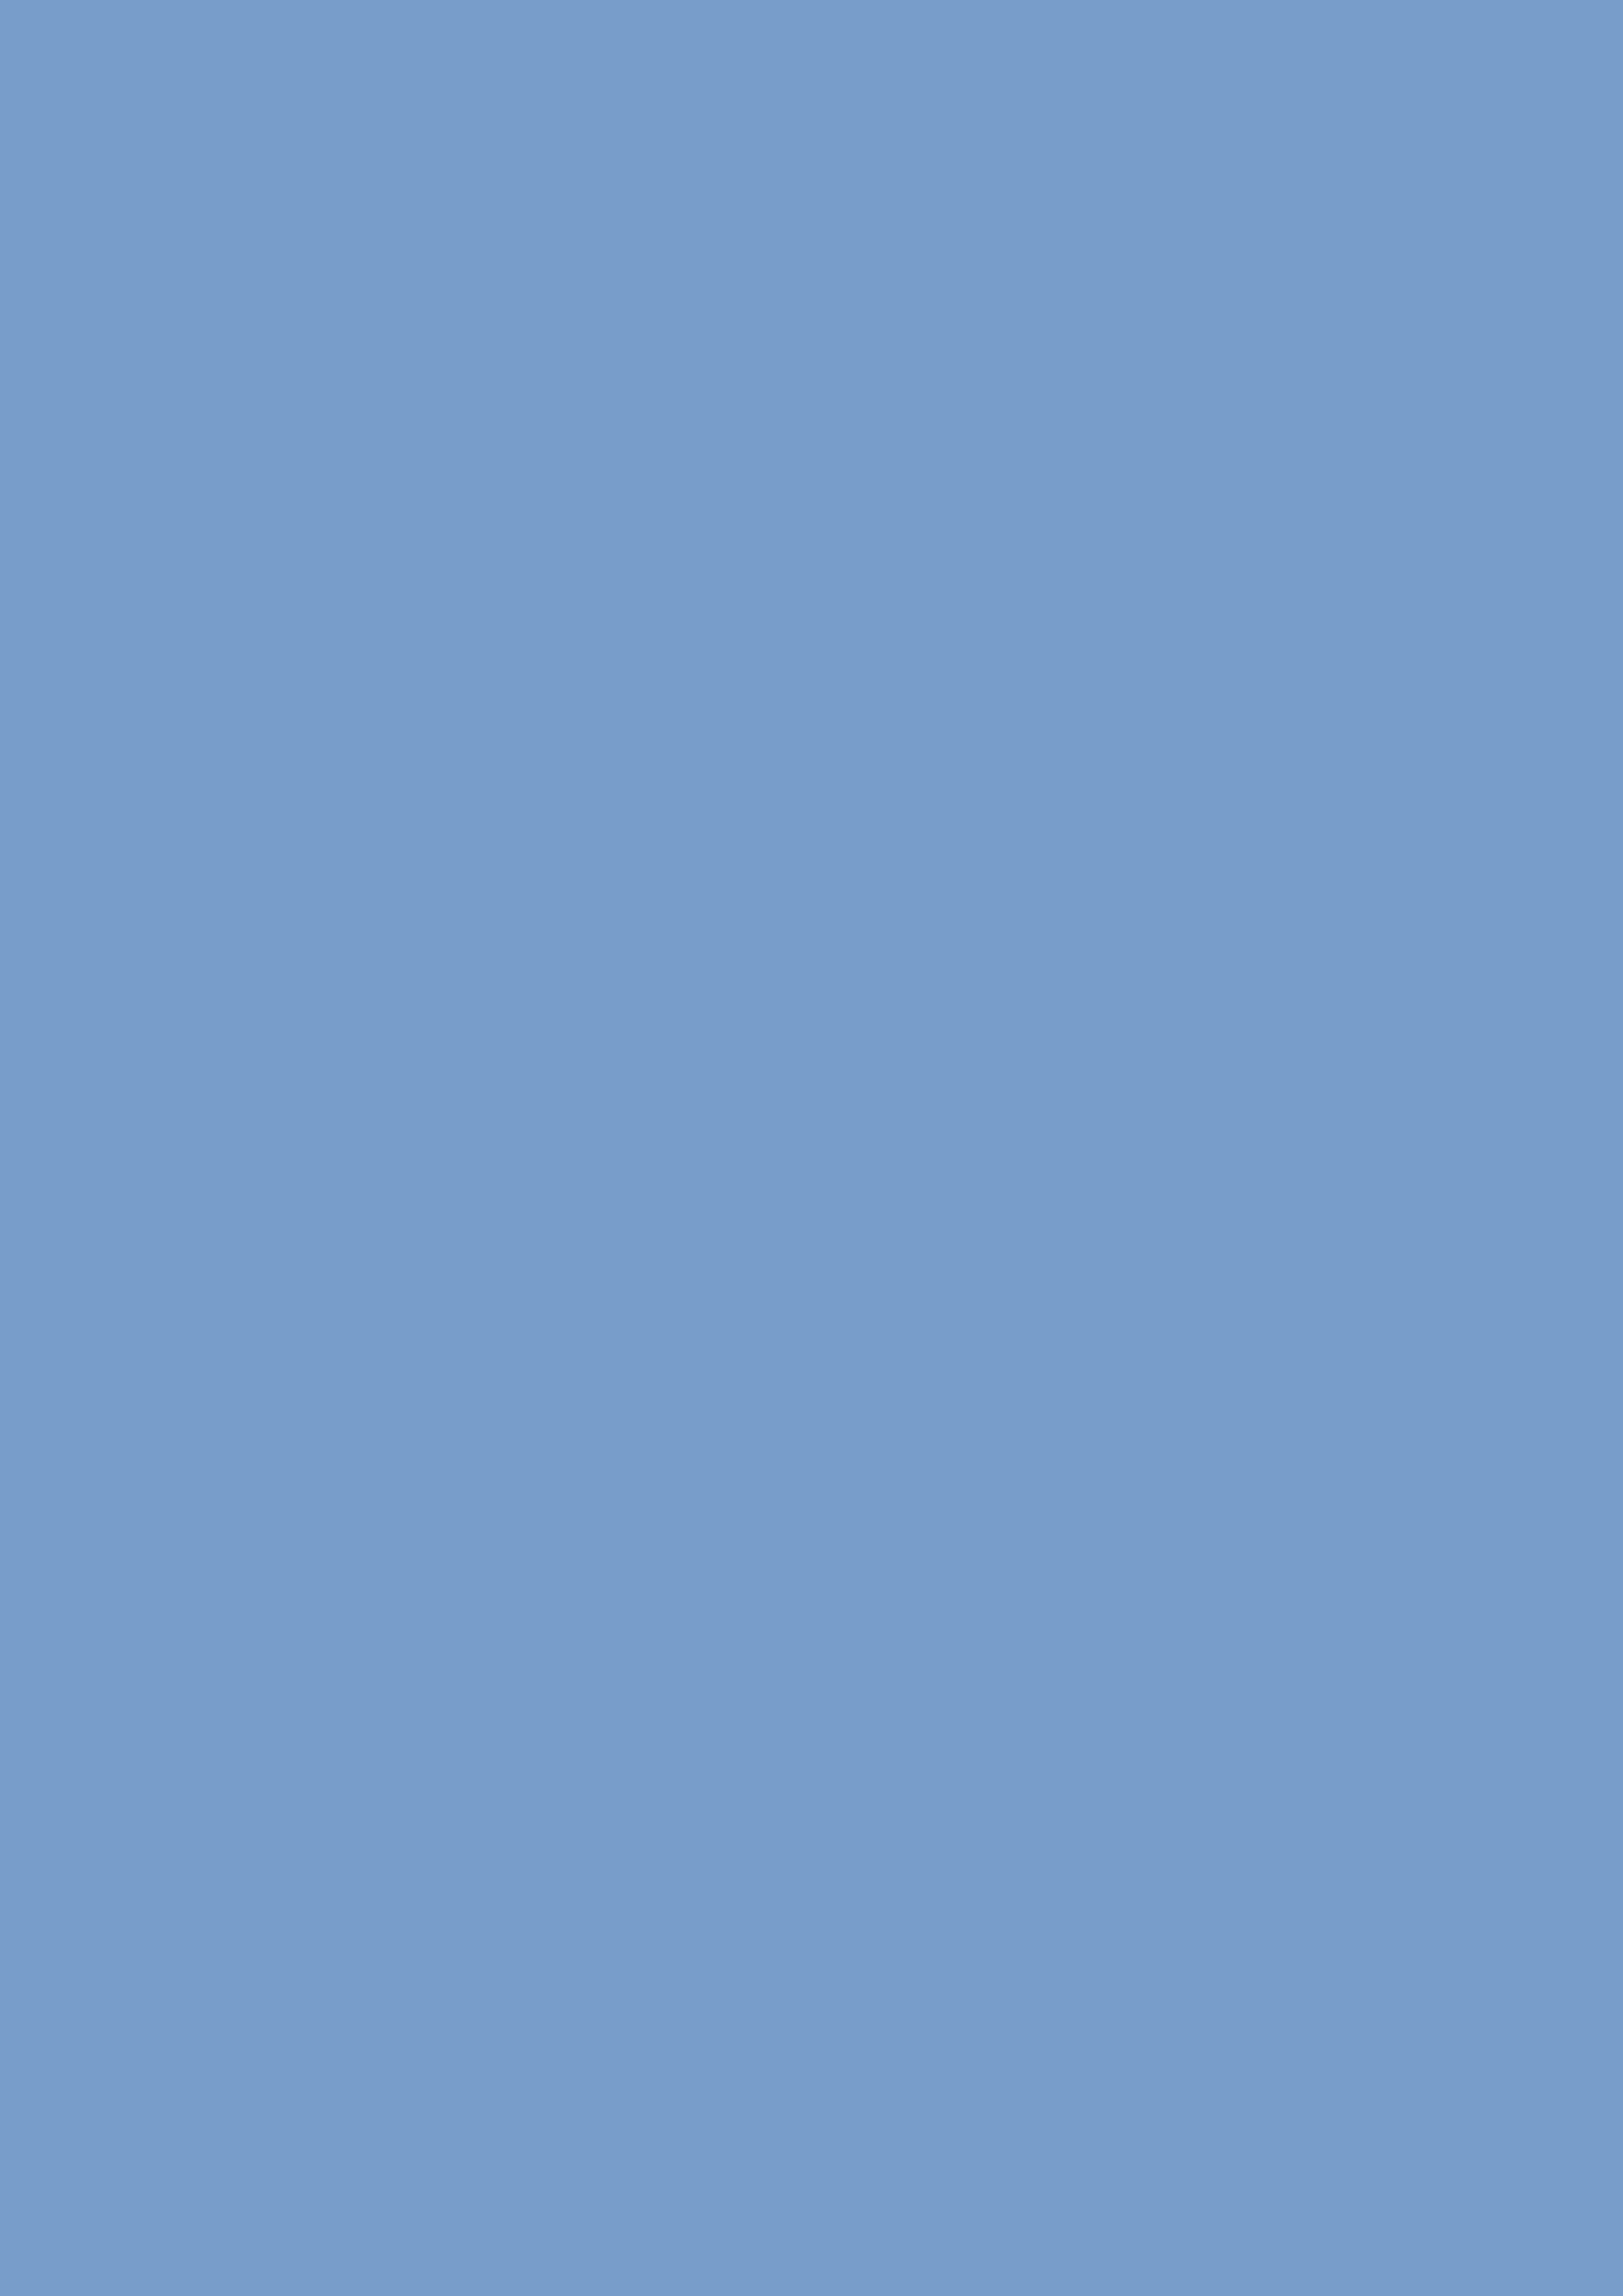 2480x3508 Dark Pastel Blue Solid Color Background